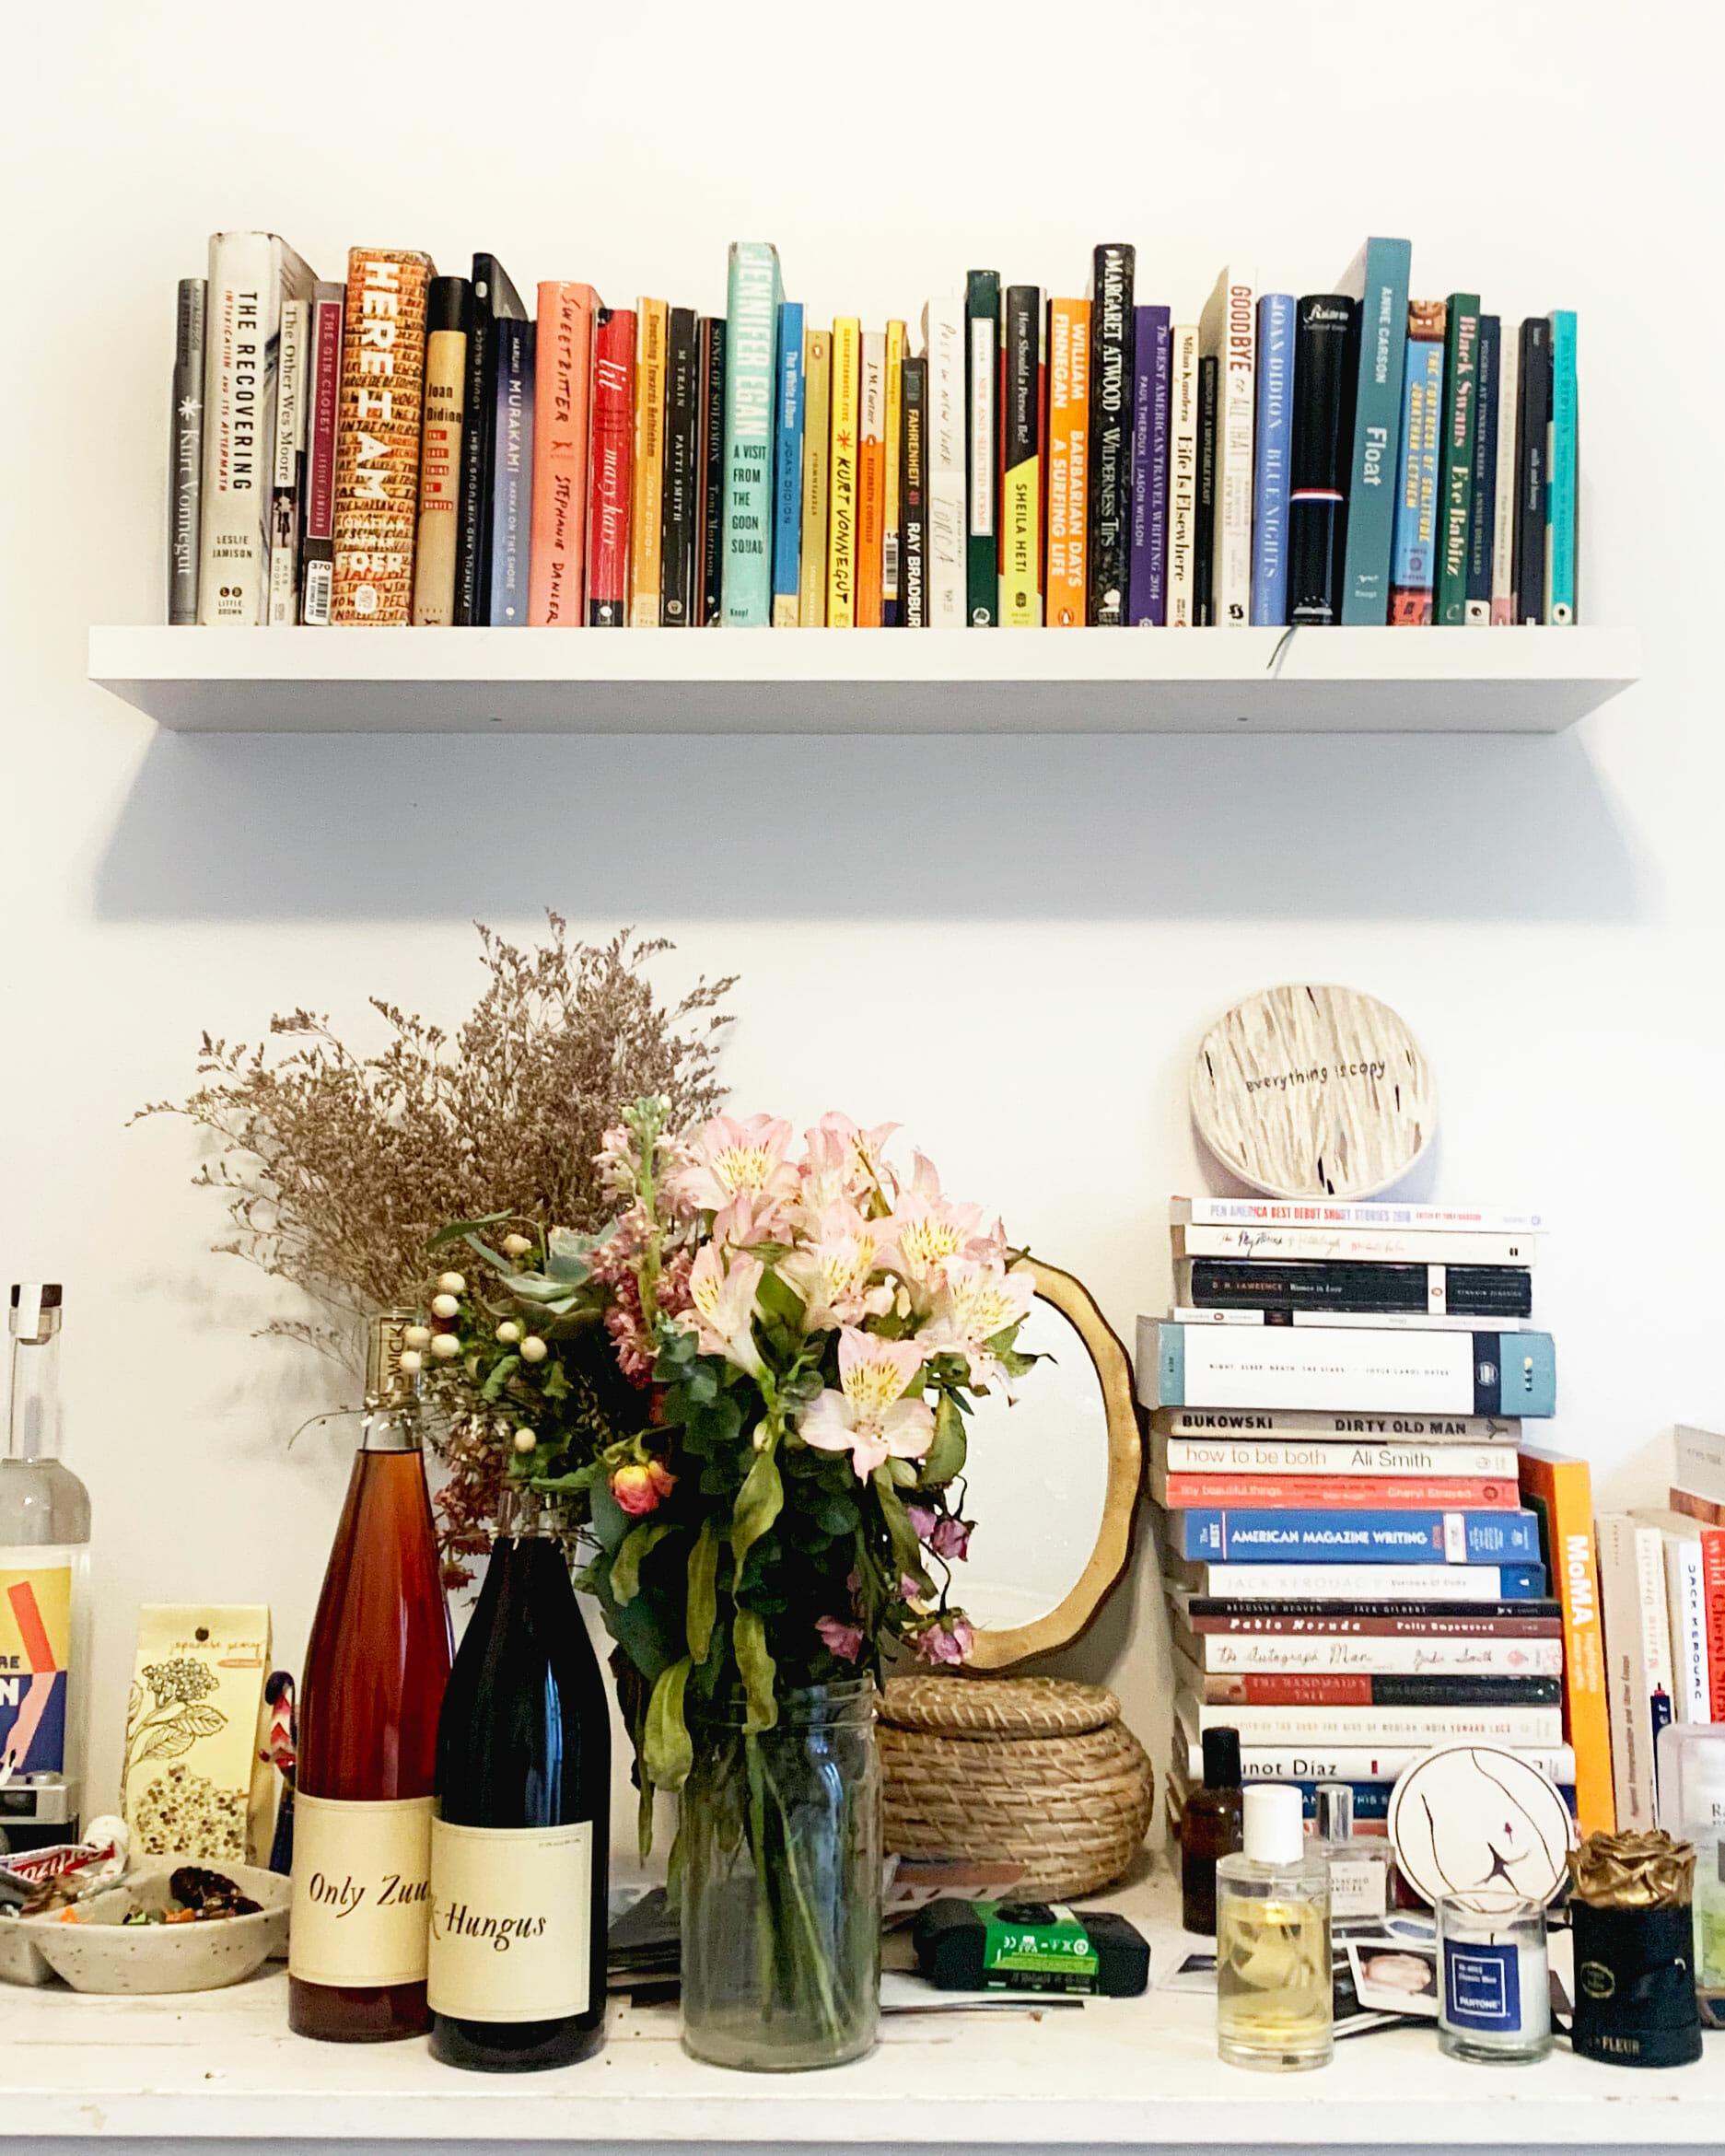 Lending Books: A Manifesto